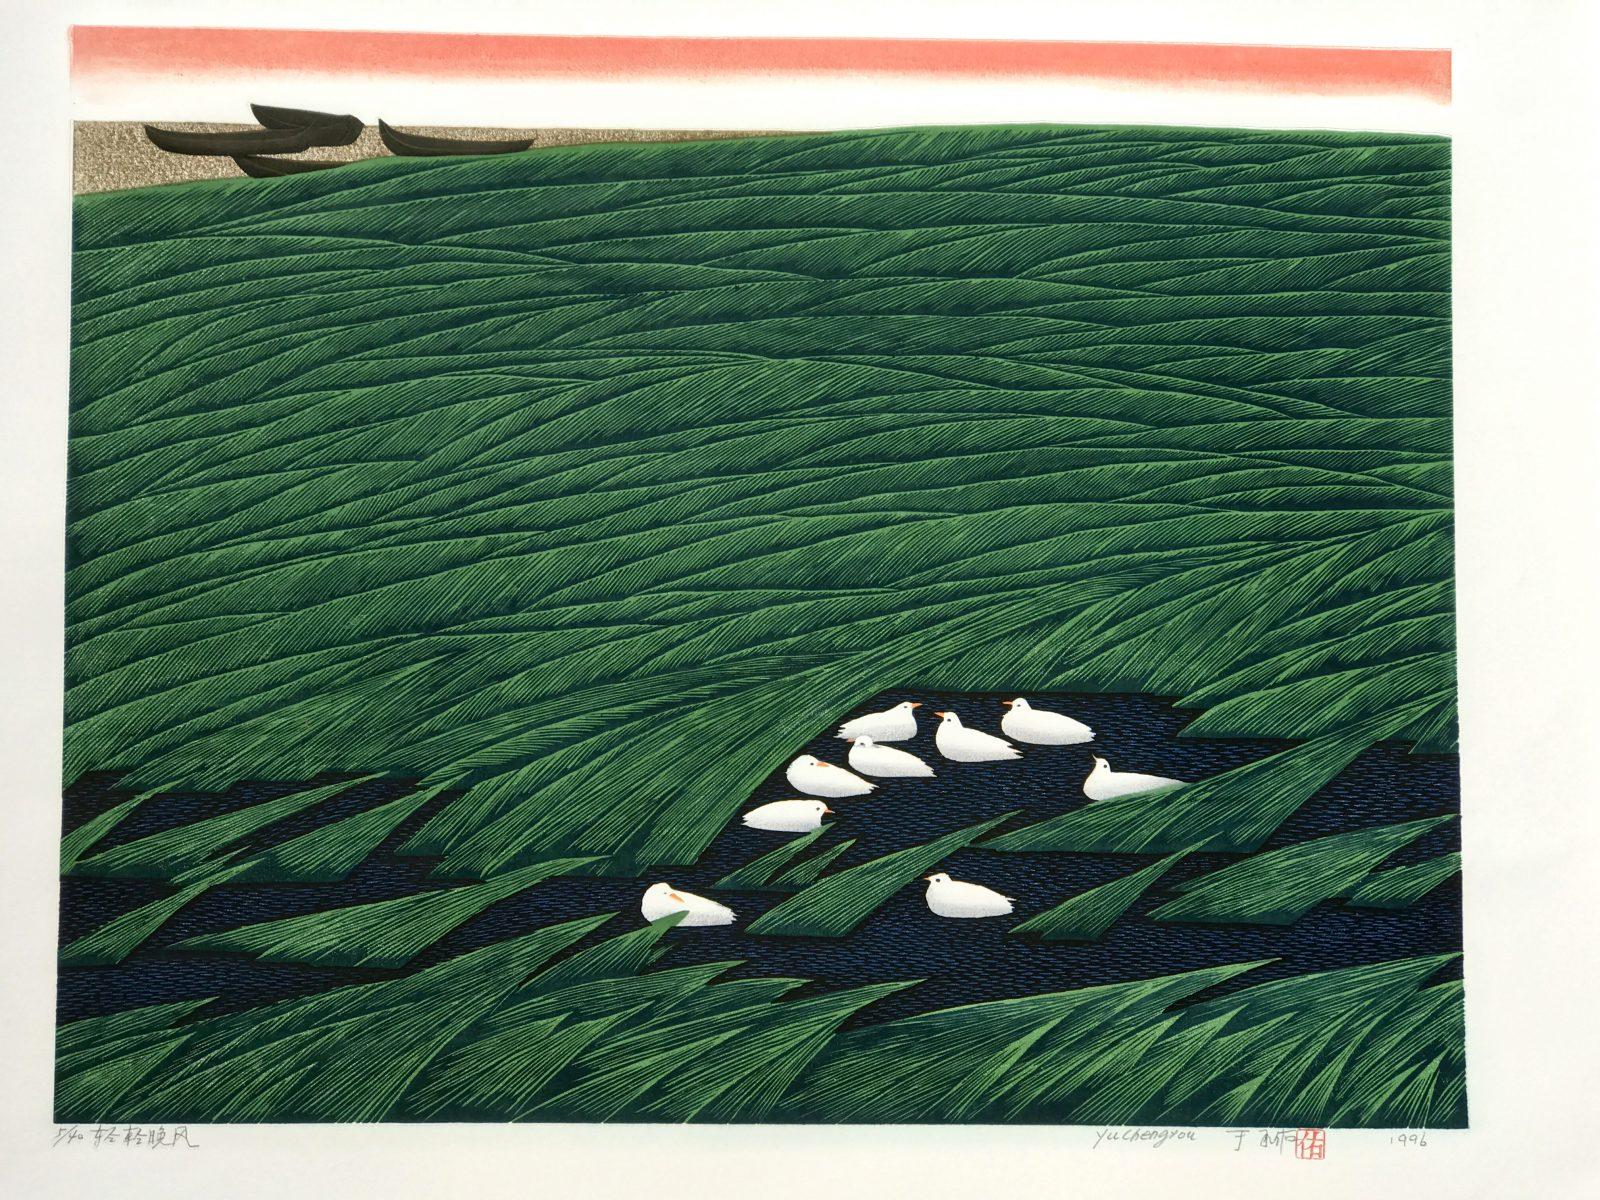 Breeze 5:40 by Yu Chengyou,63cmx43cm